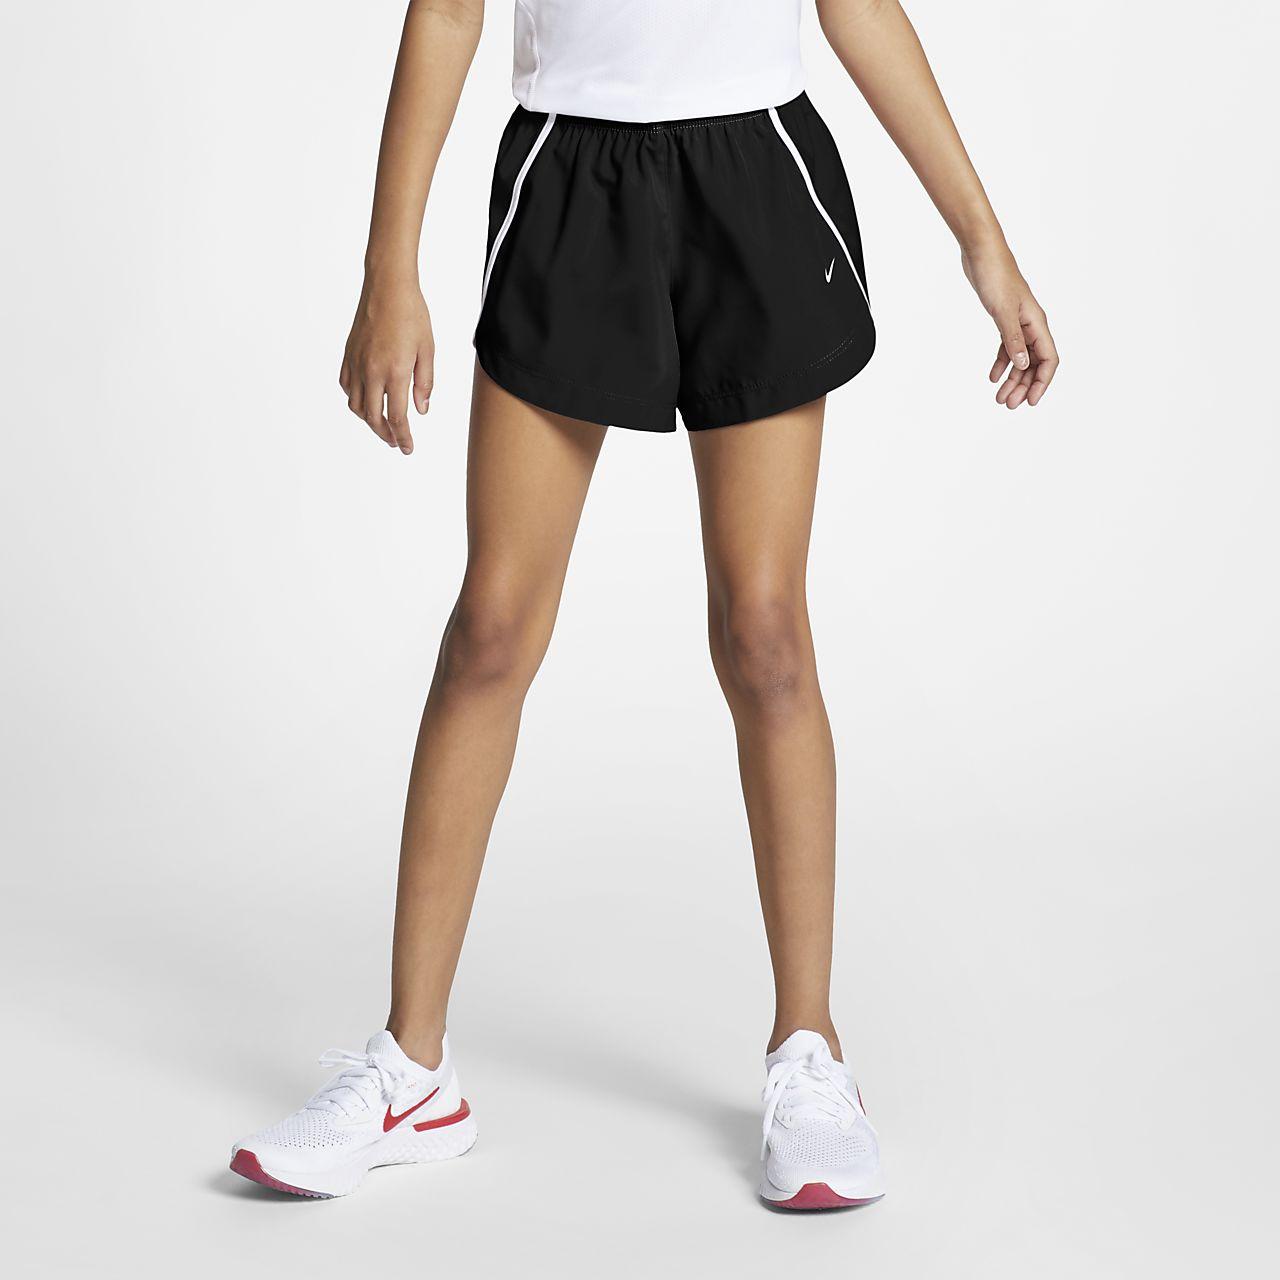 meilleures baskets 9ffcf 78bb8 Short de running Nike Dri-FIT Run 7,5 cm pour Fille plus âgée